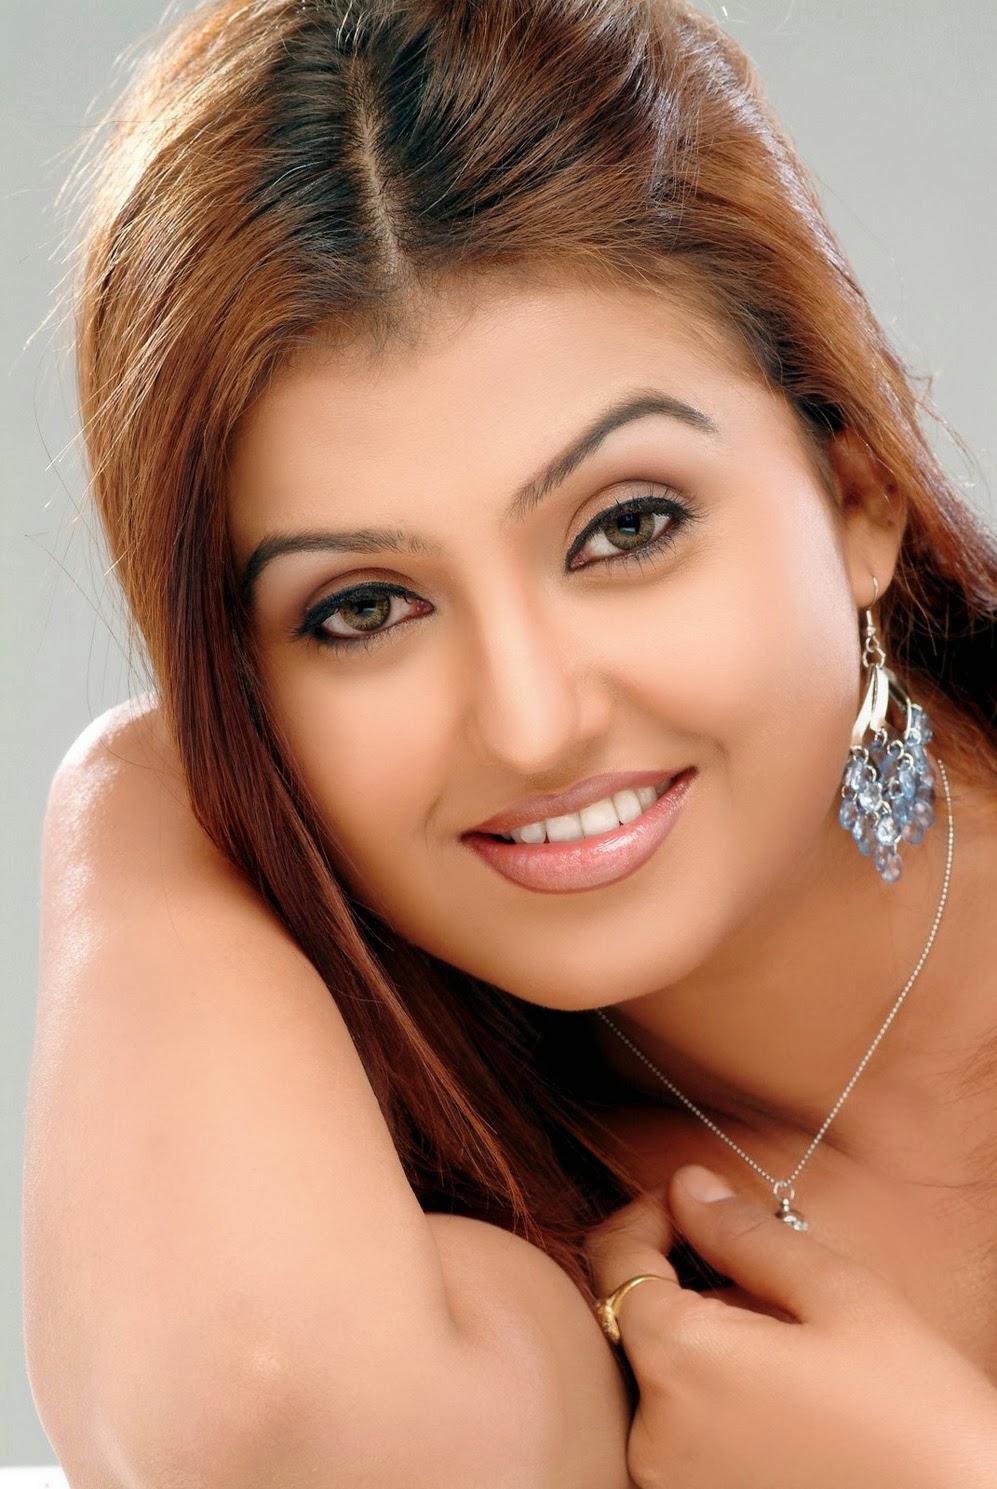 Pakistani Xnxx: Desi Bhabhi Hot Nude Photo Album: Masala